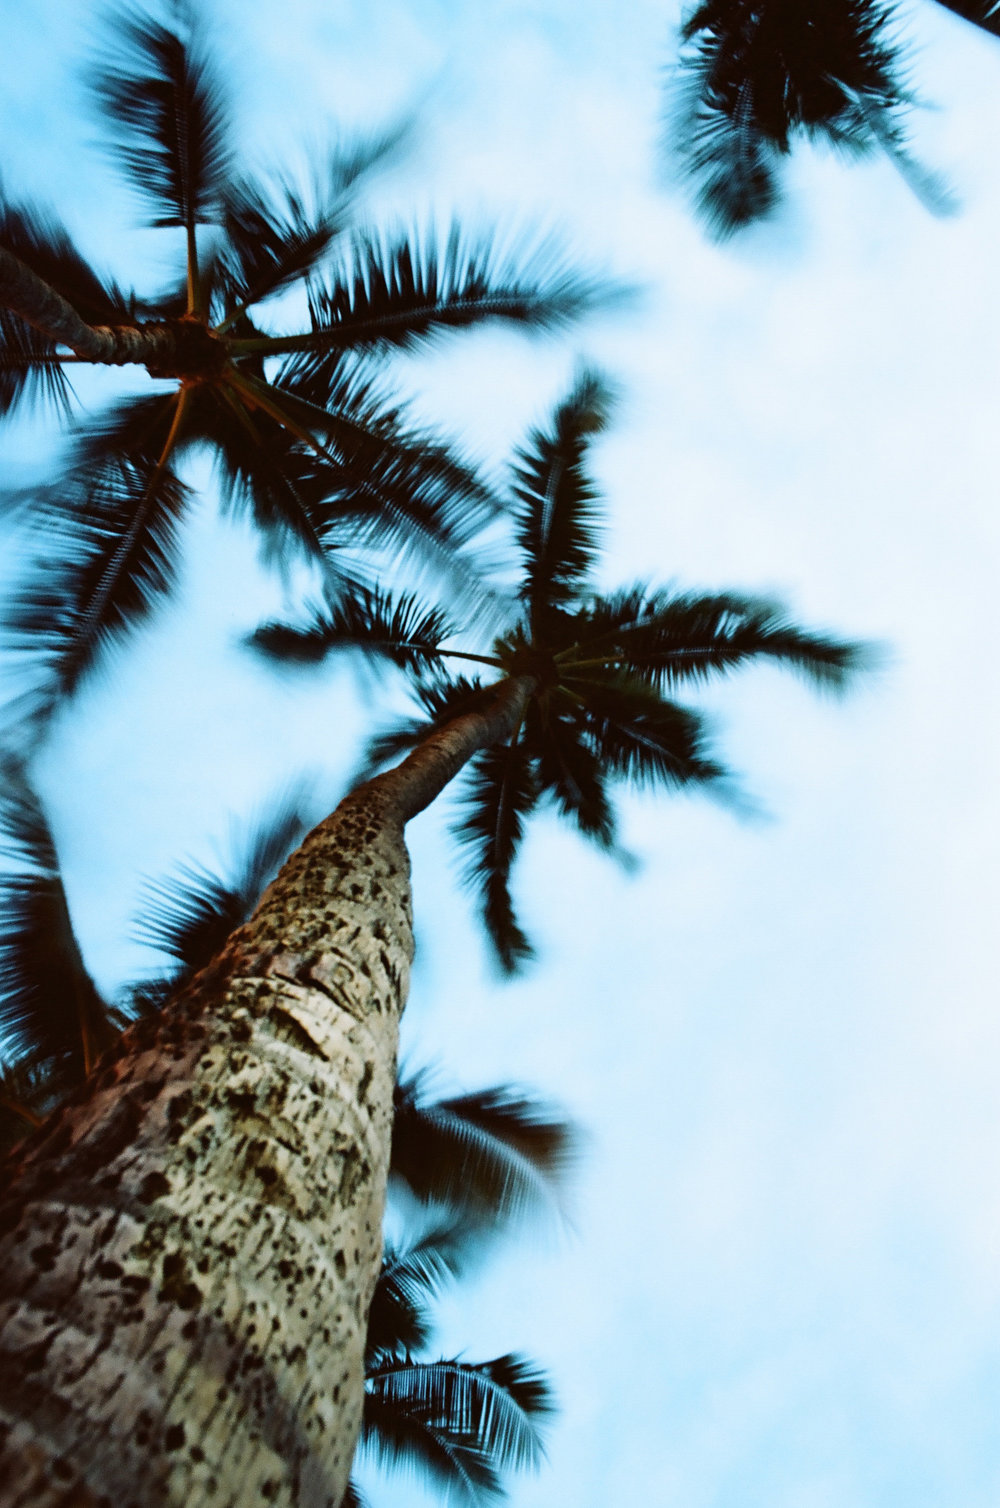 TreesMotion02.jpg